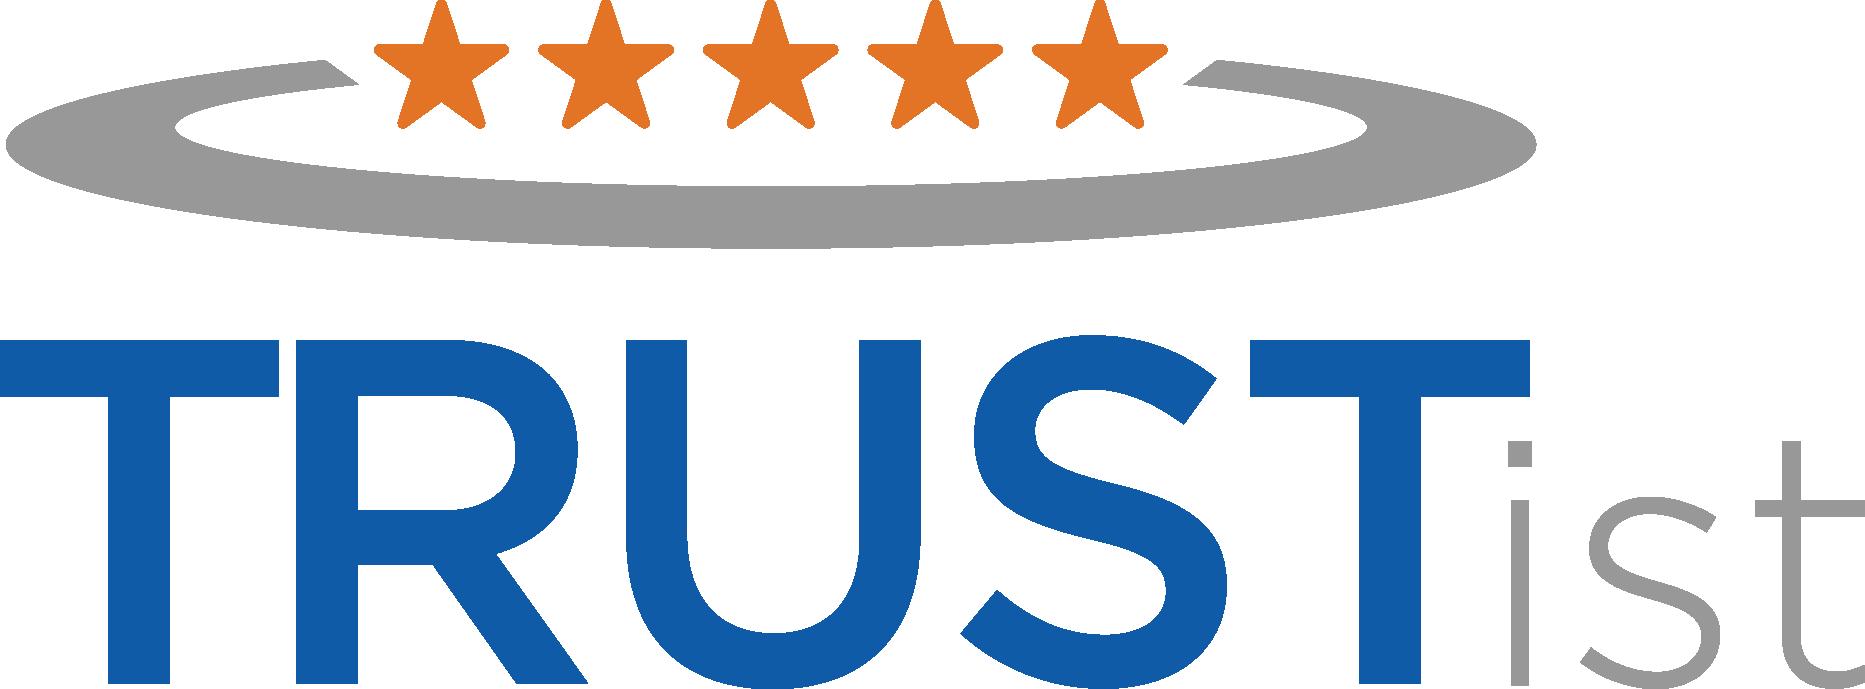 5-star-ciustomer-reviews-building-services-barnes